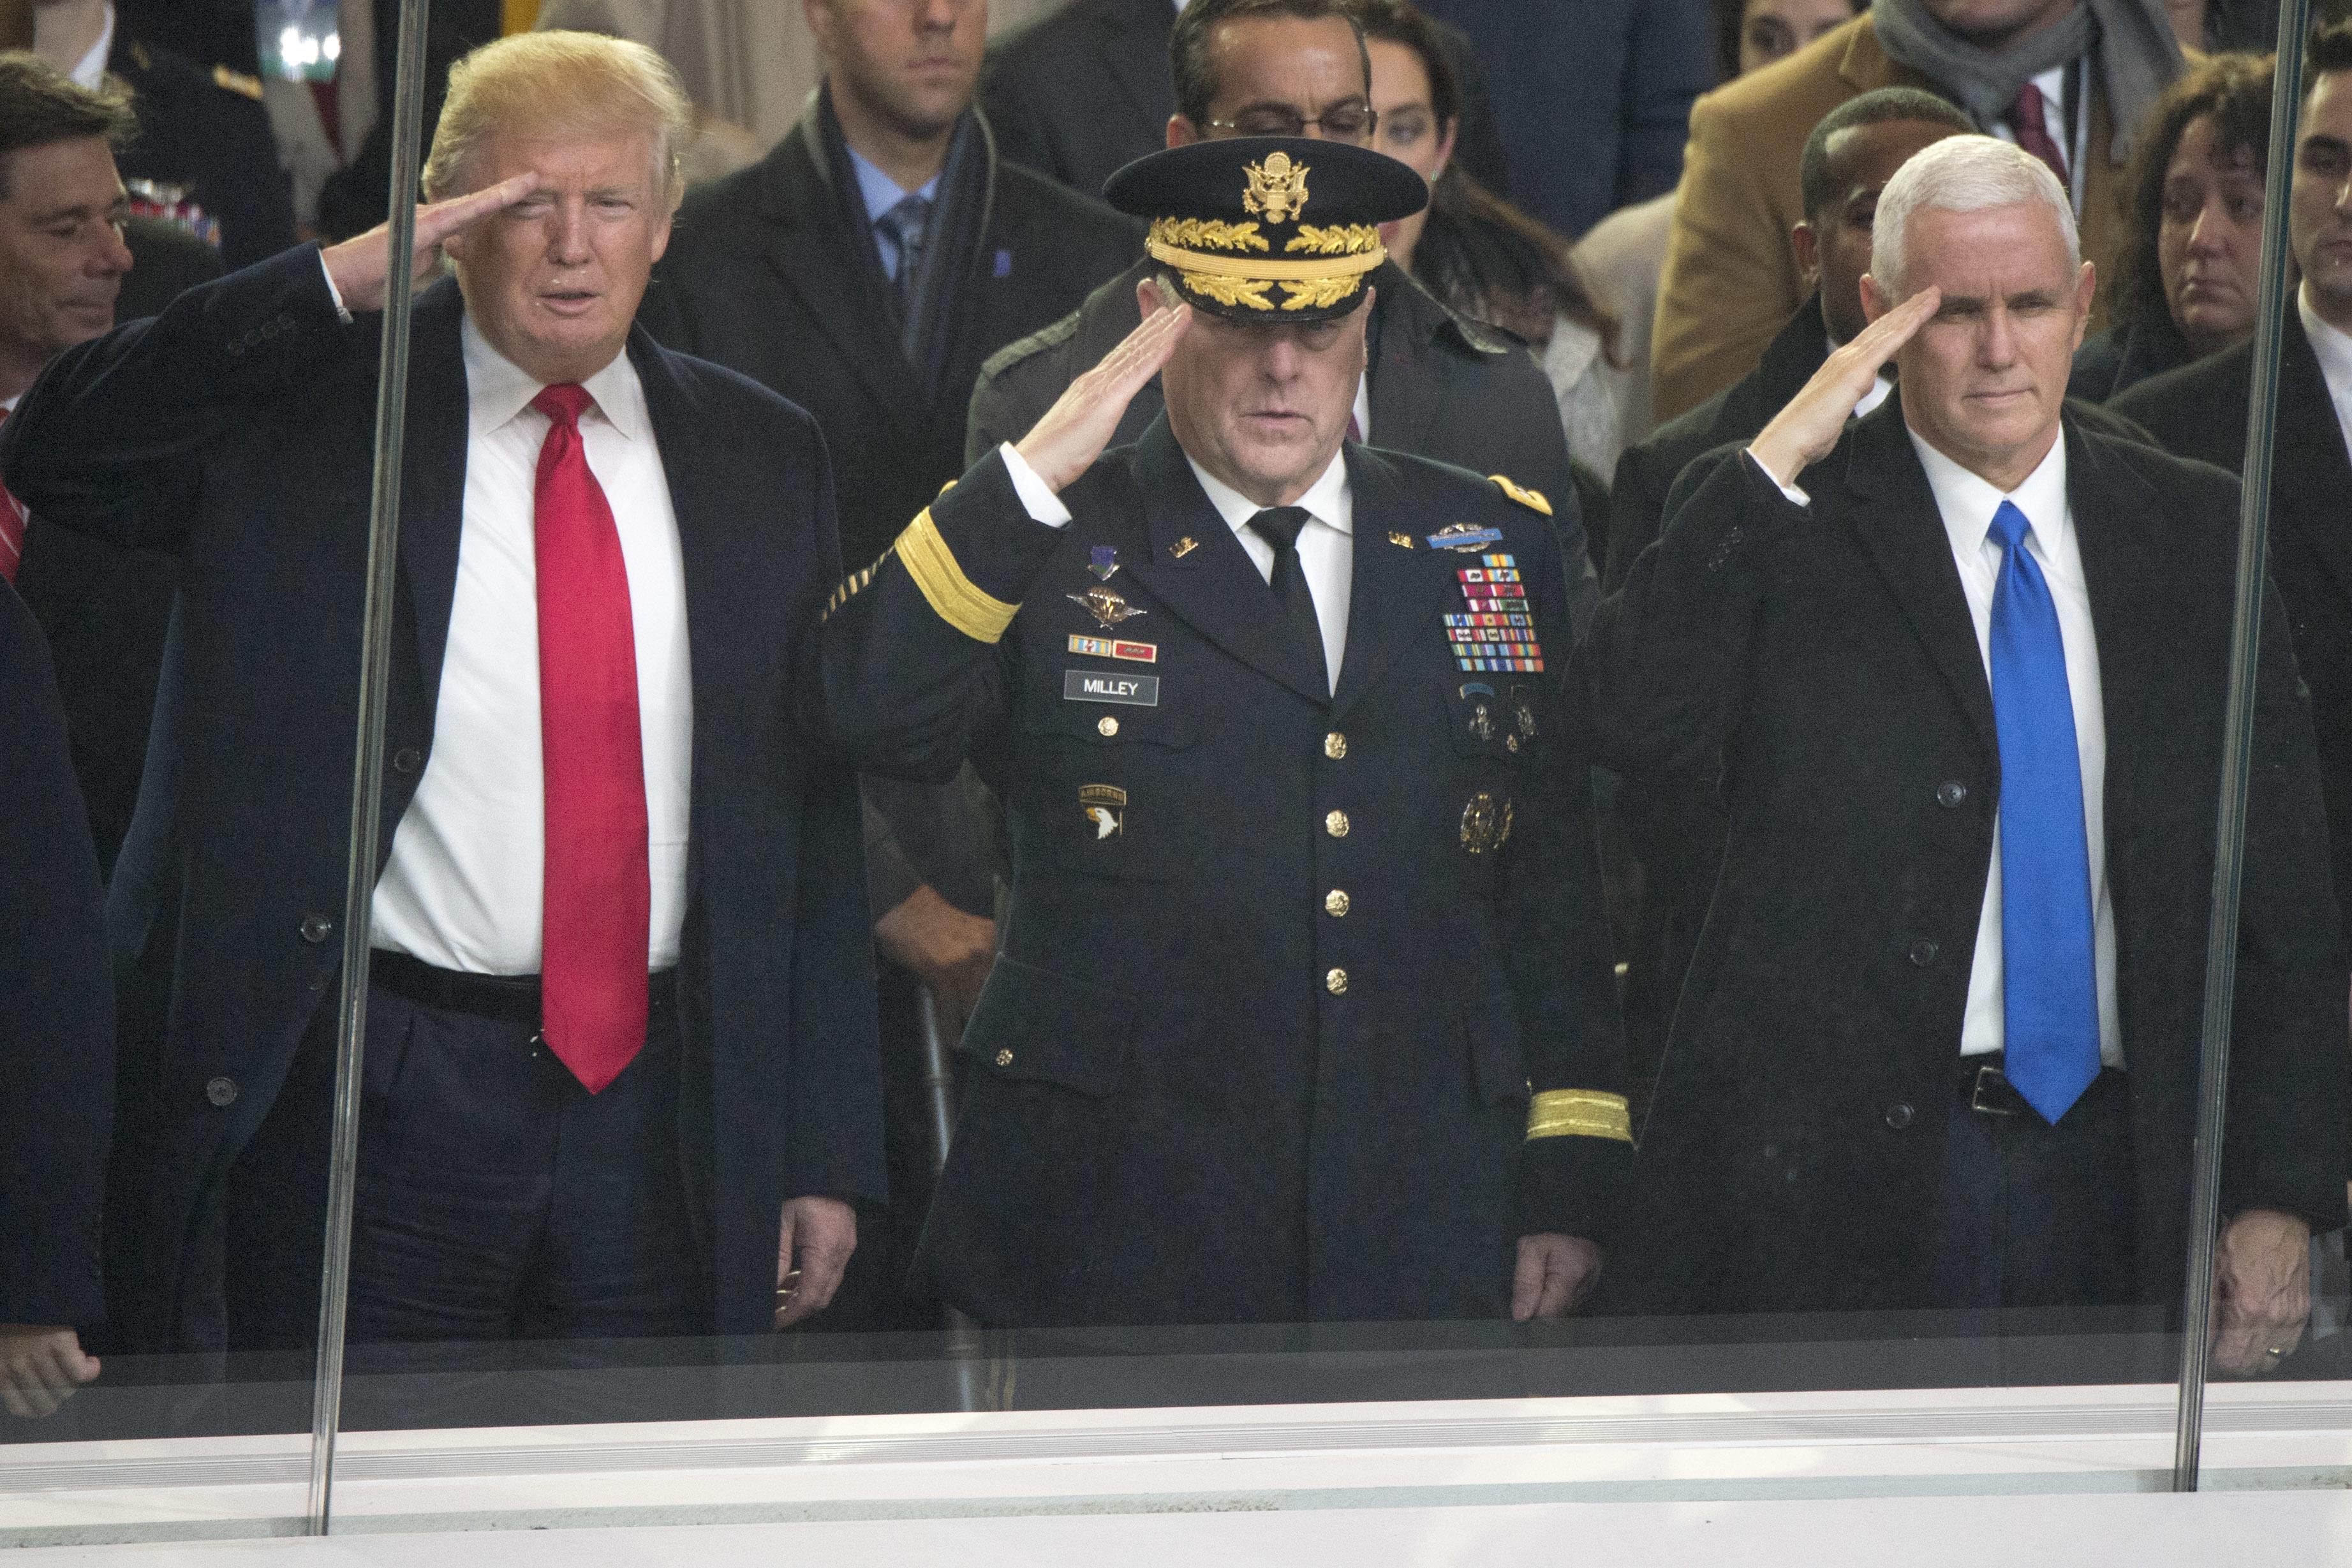 Trump With Palin Kid Rock Nugetn